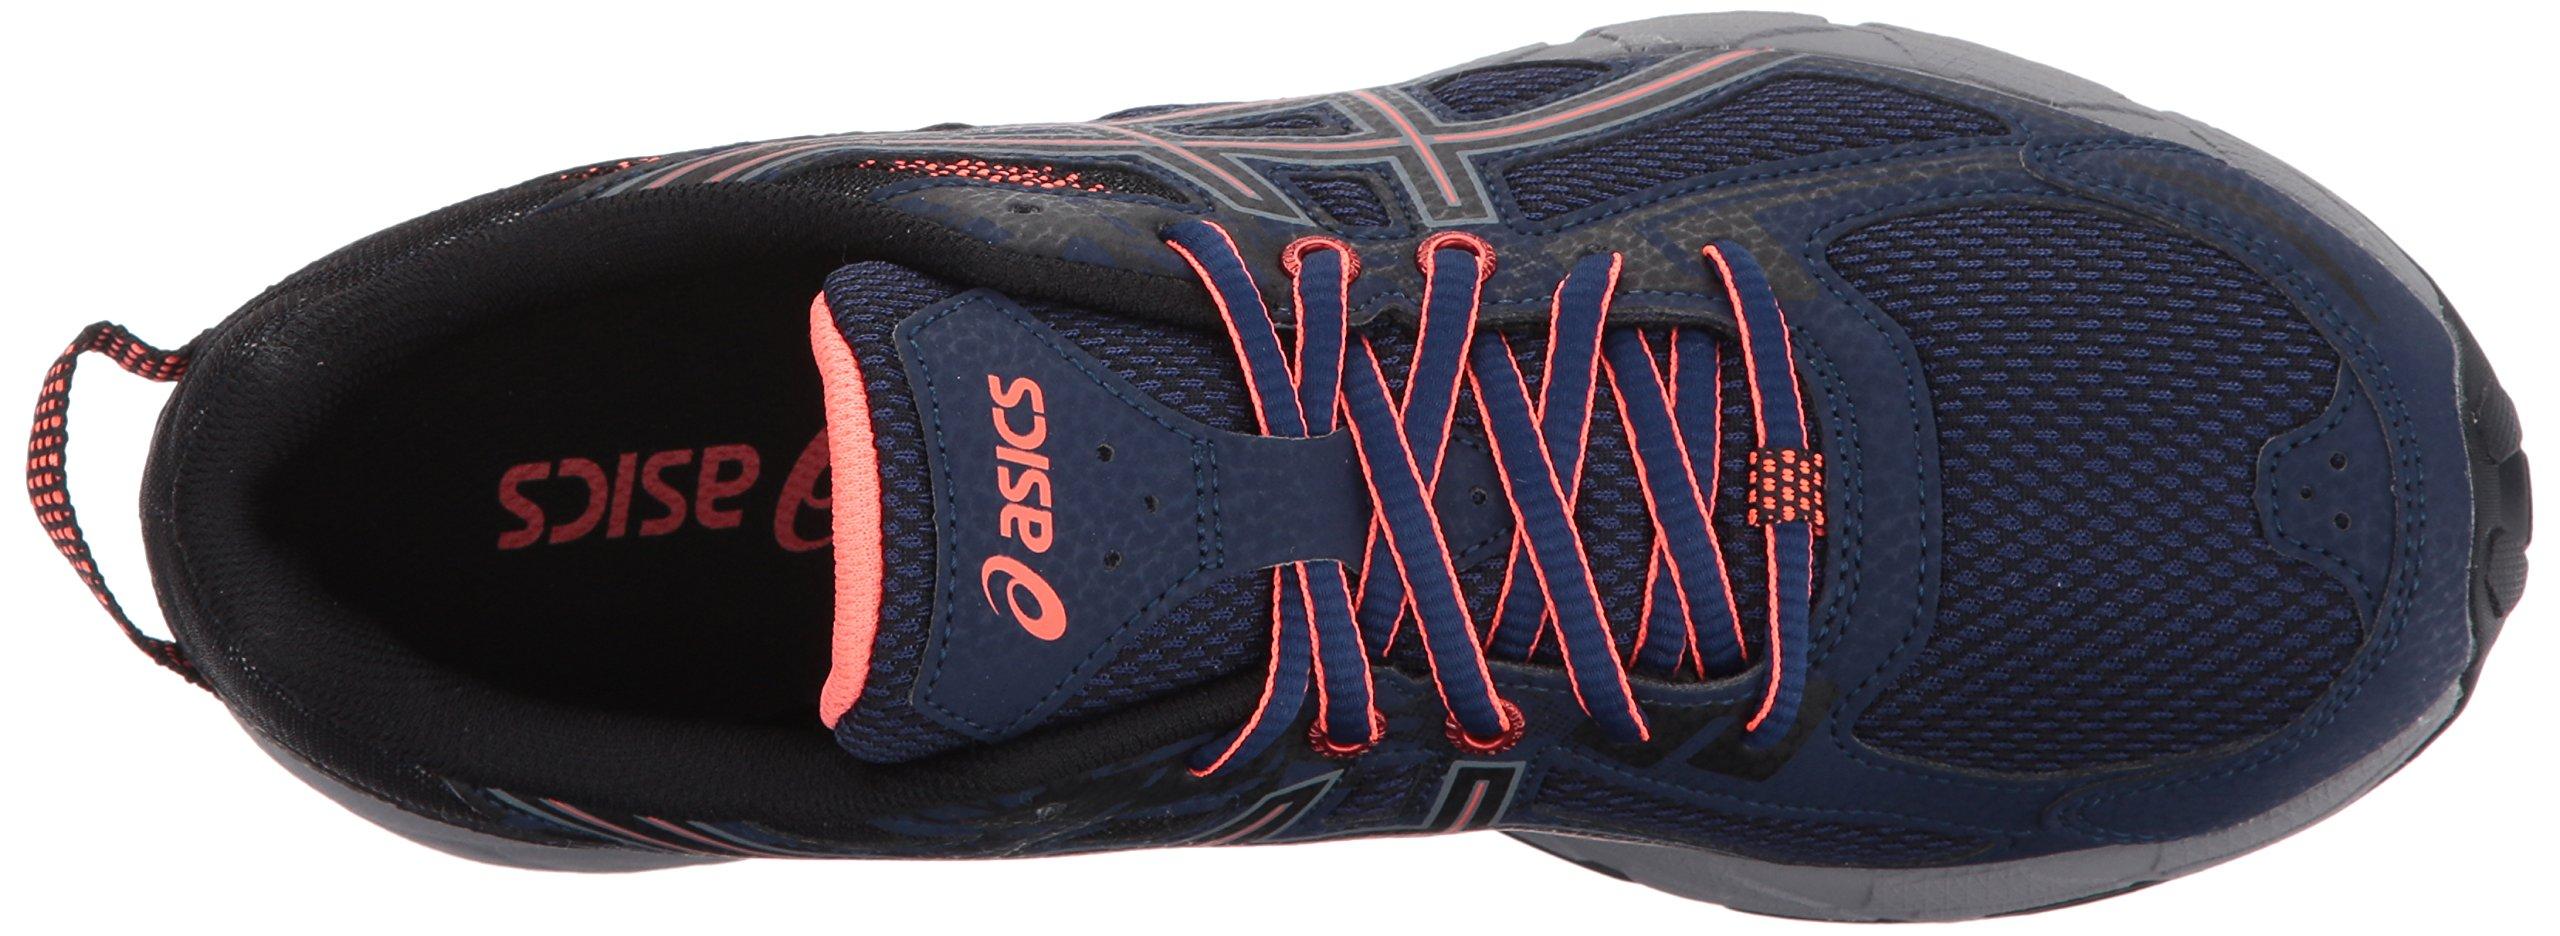 ASICS Women's Gel-Venture 6 Running-Shoes,Indigo Blue/Black/Coral,5 Medium US by ASICS (Image #8)